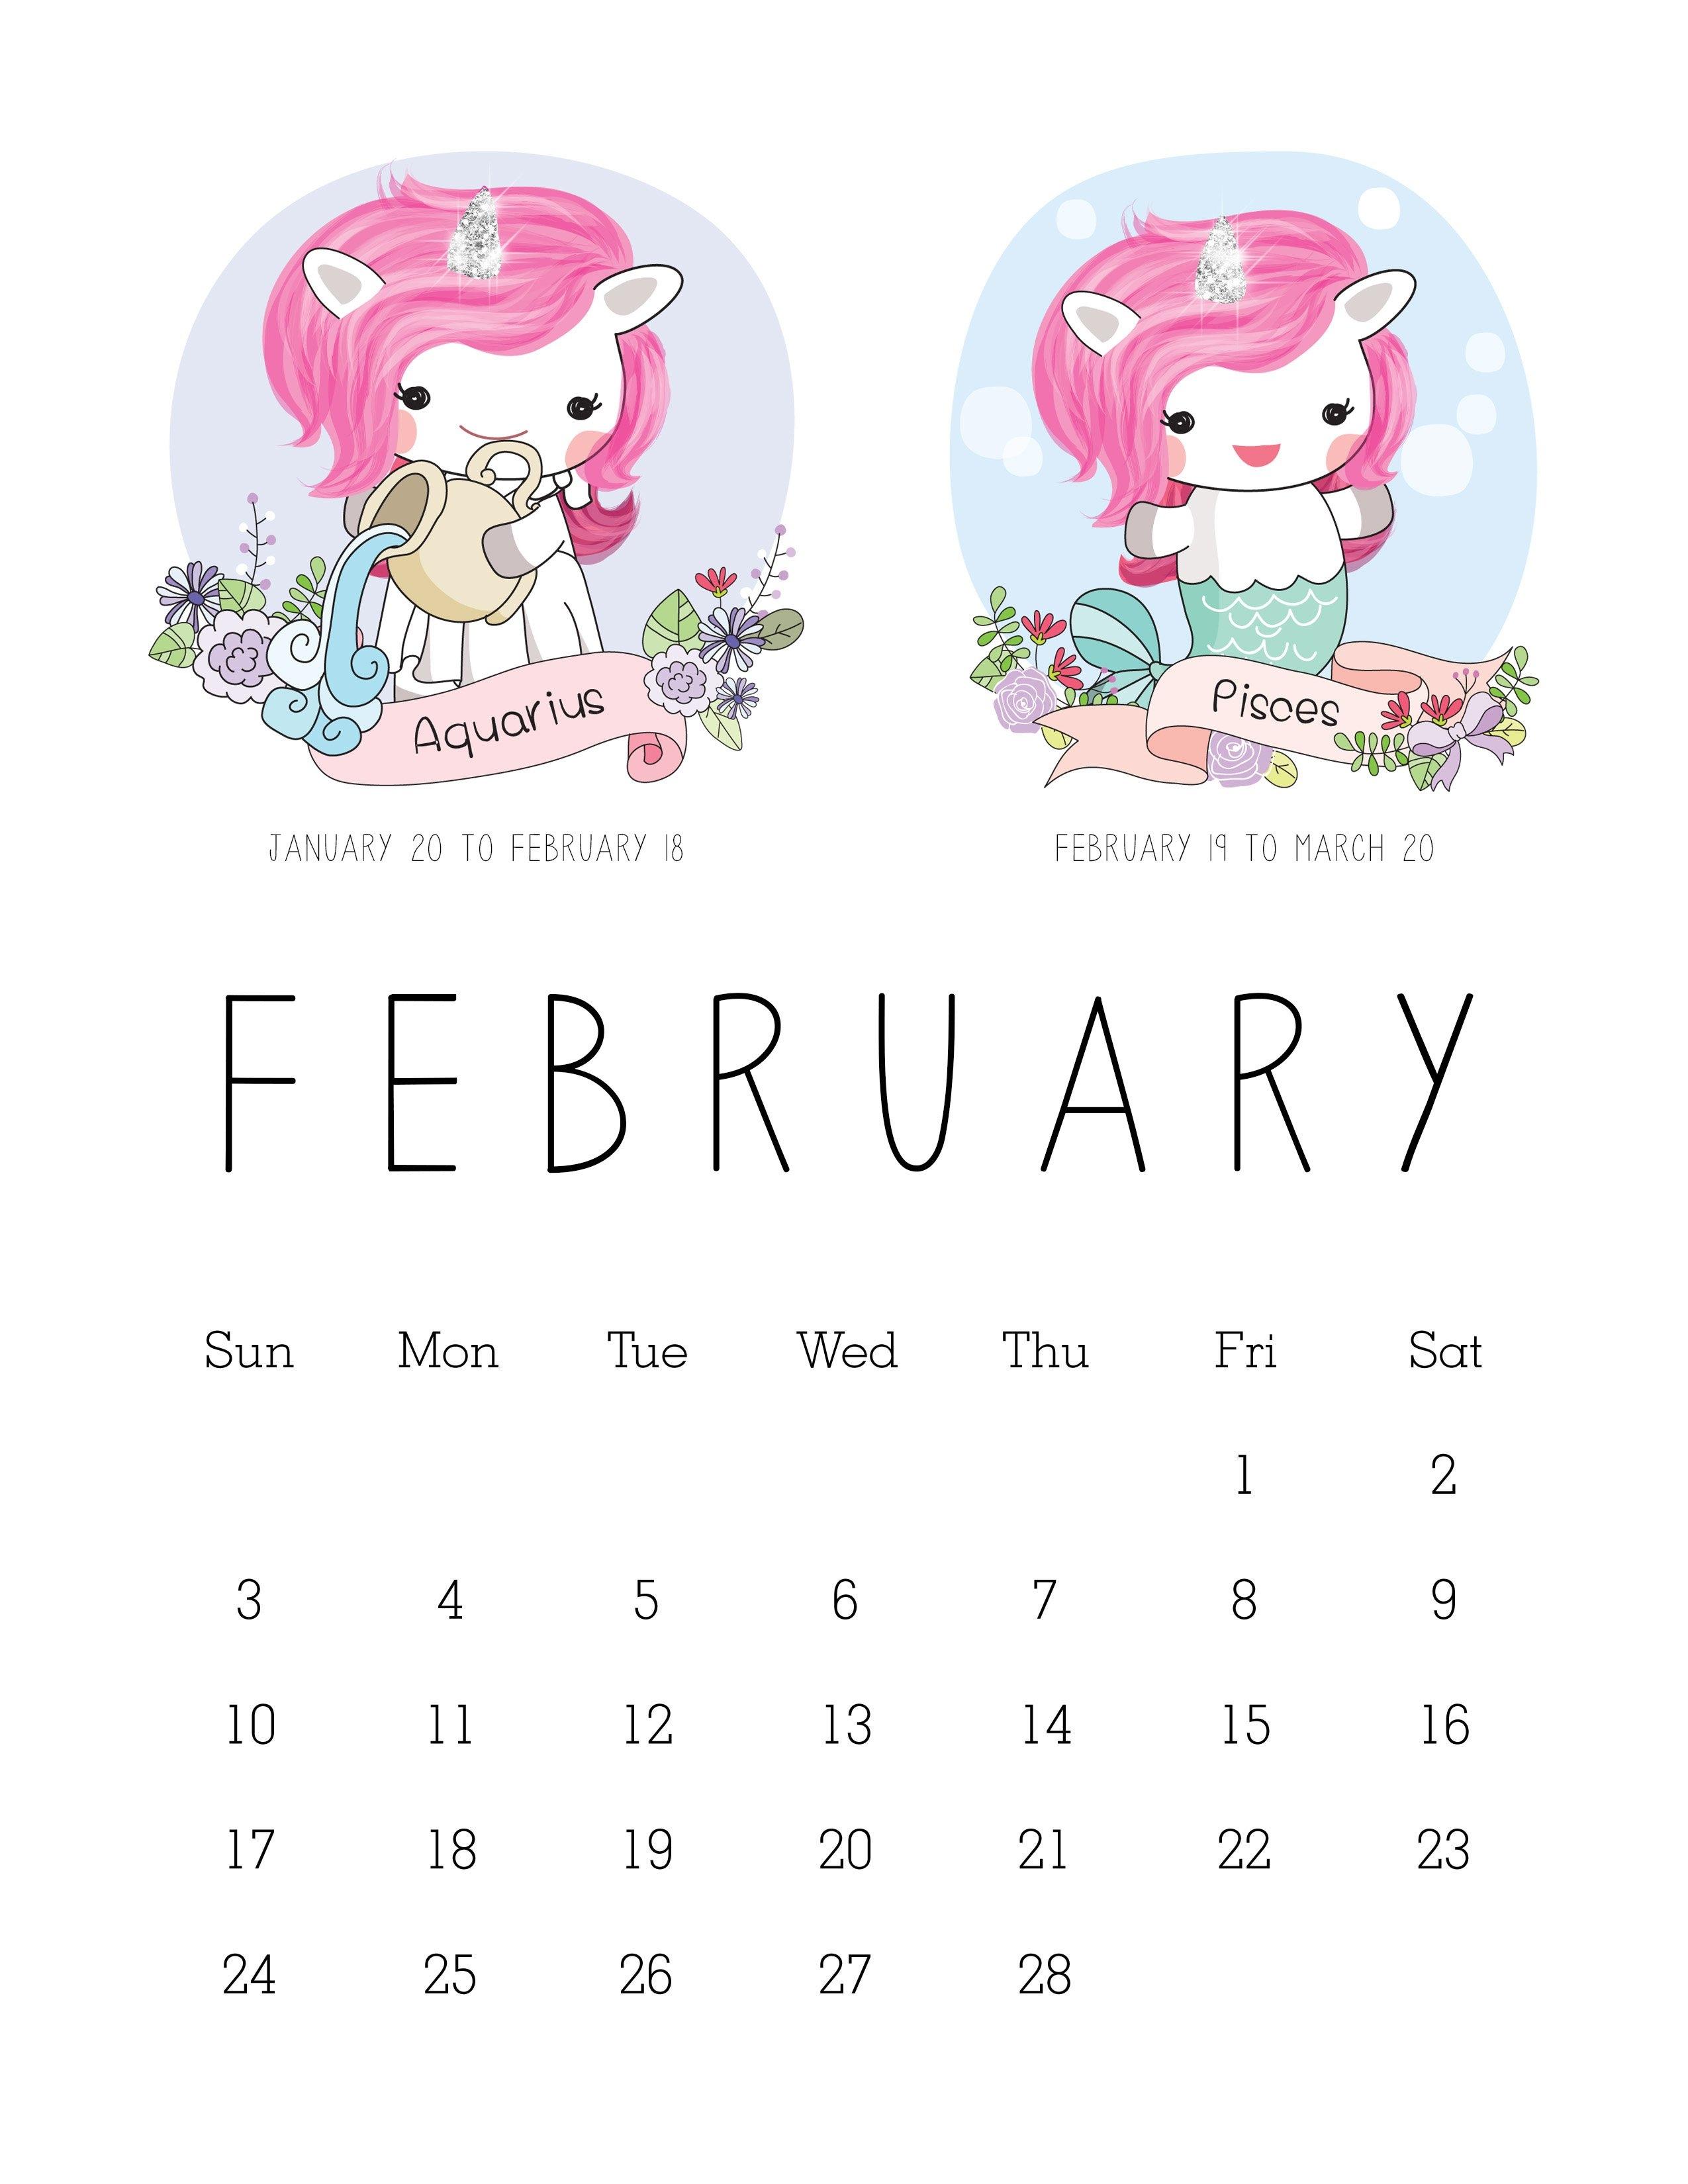 Free Printable 2019 Zodiac Sign Kawaii Unicorn Calendar - The Calendar 2019 Unicorn